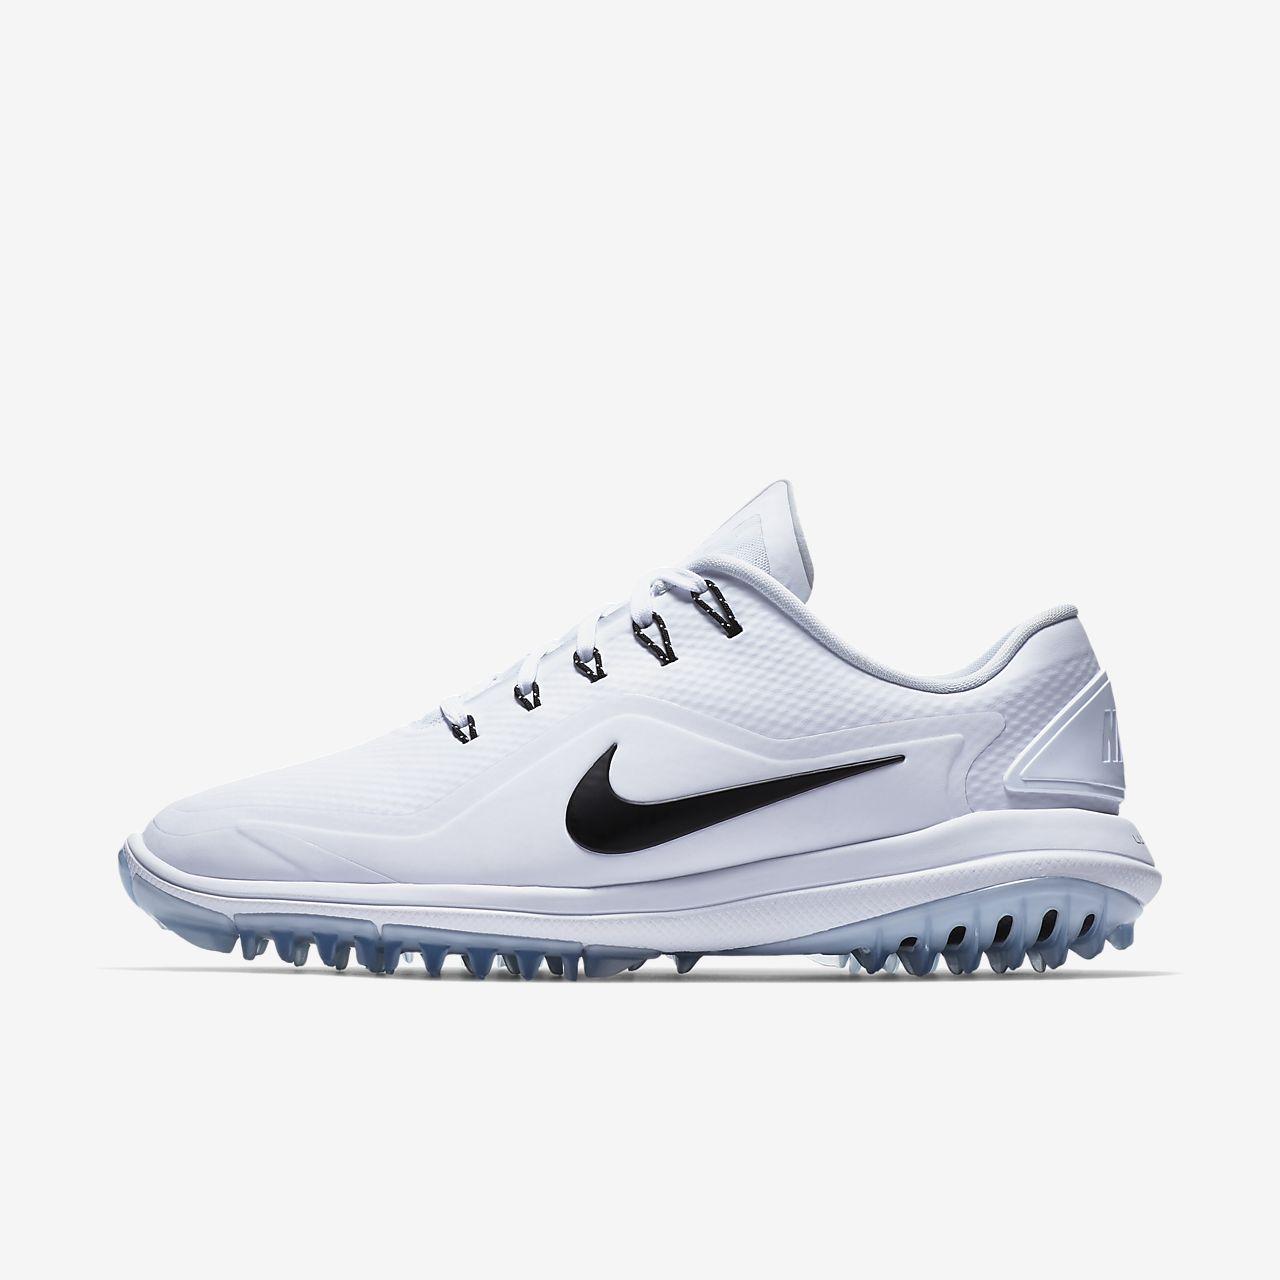 quality design 03d3a 8a496 ... Damskie buty do golfa Nike Lunar Control Vapor 2